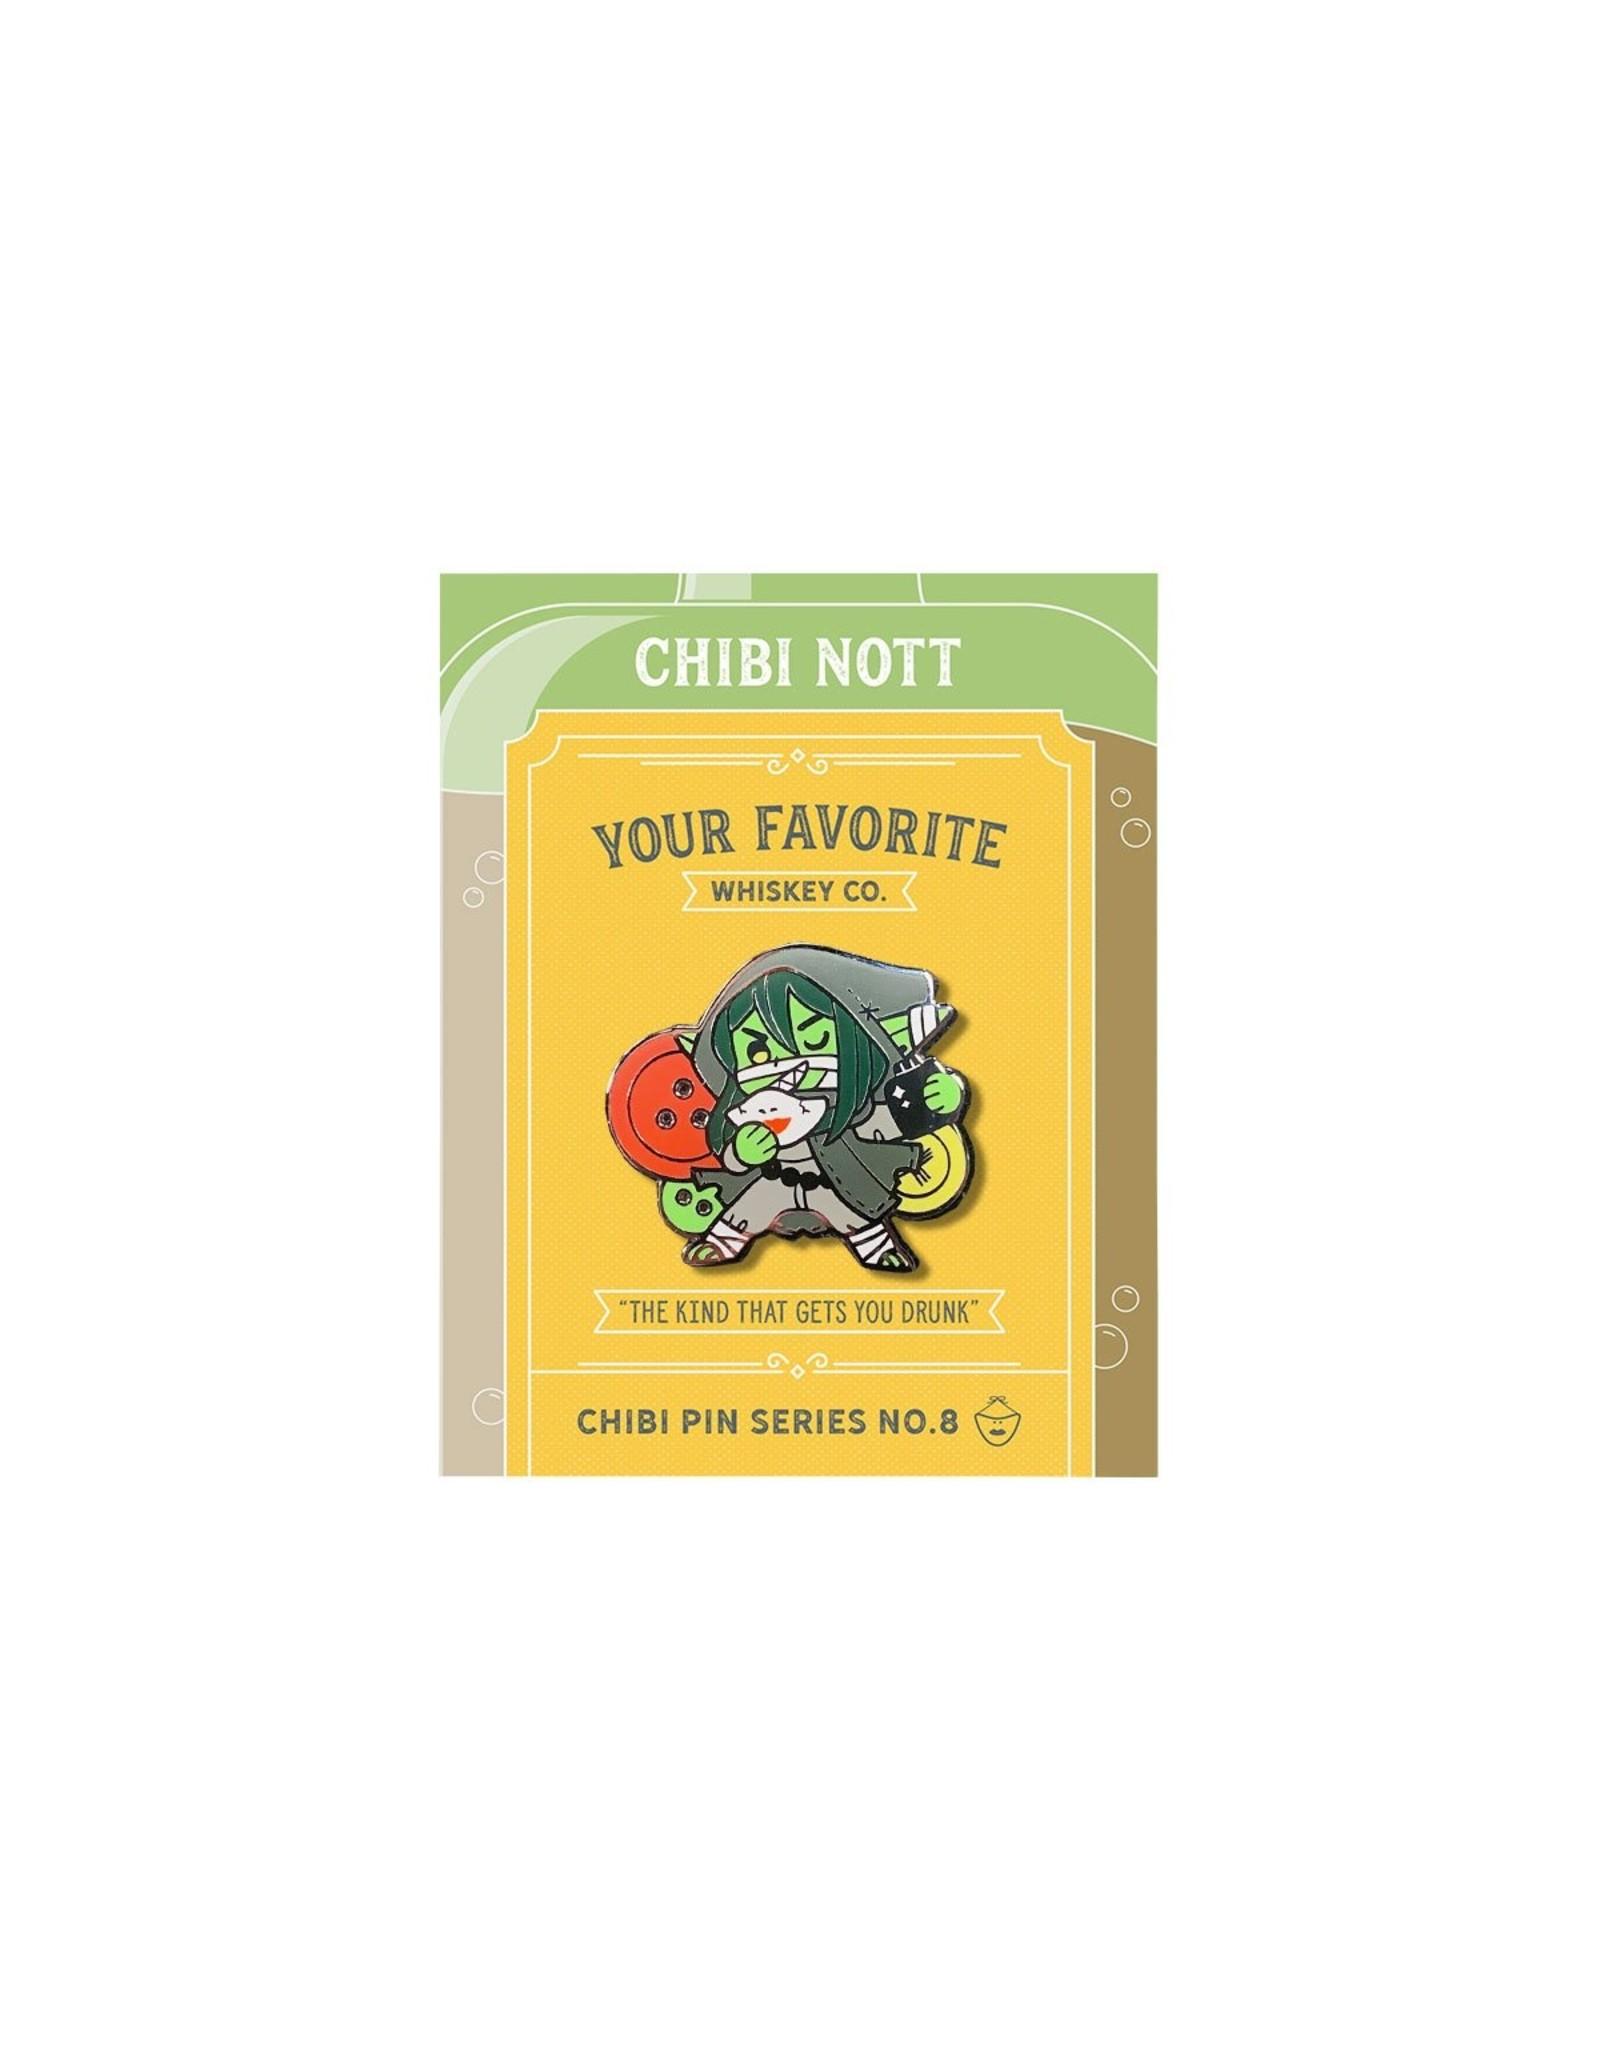 Critical Role Critical Role Chibi Pin No. 8 - Nott